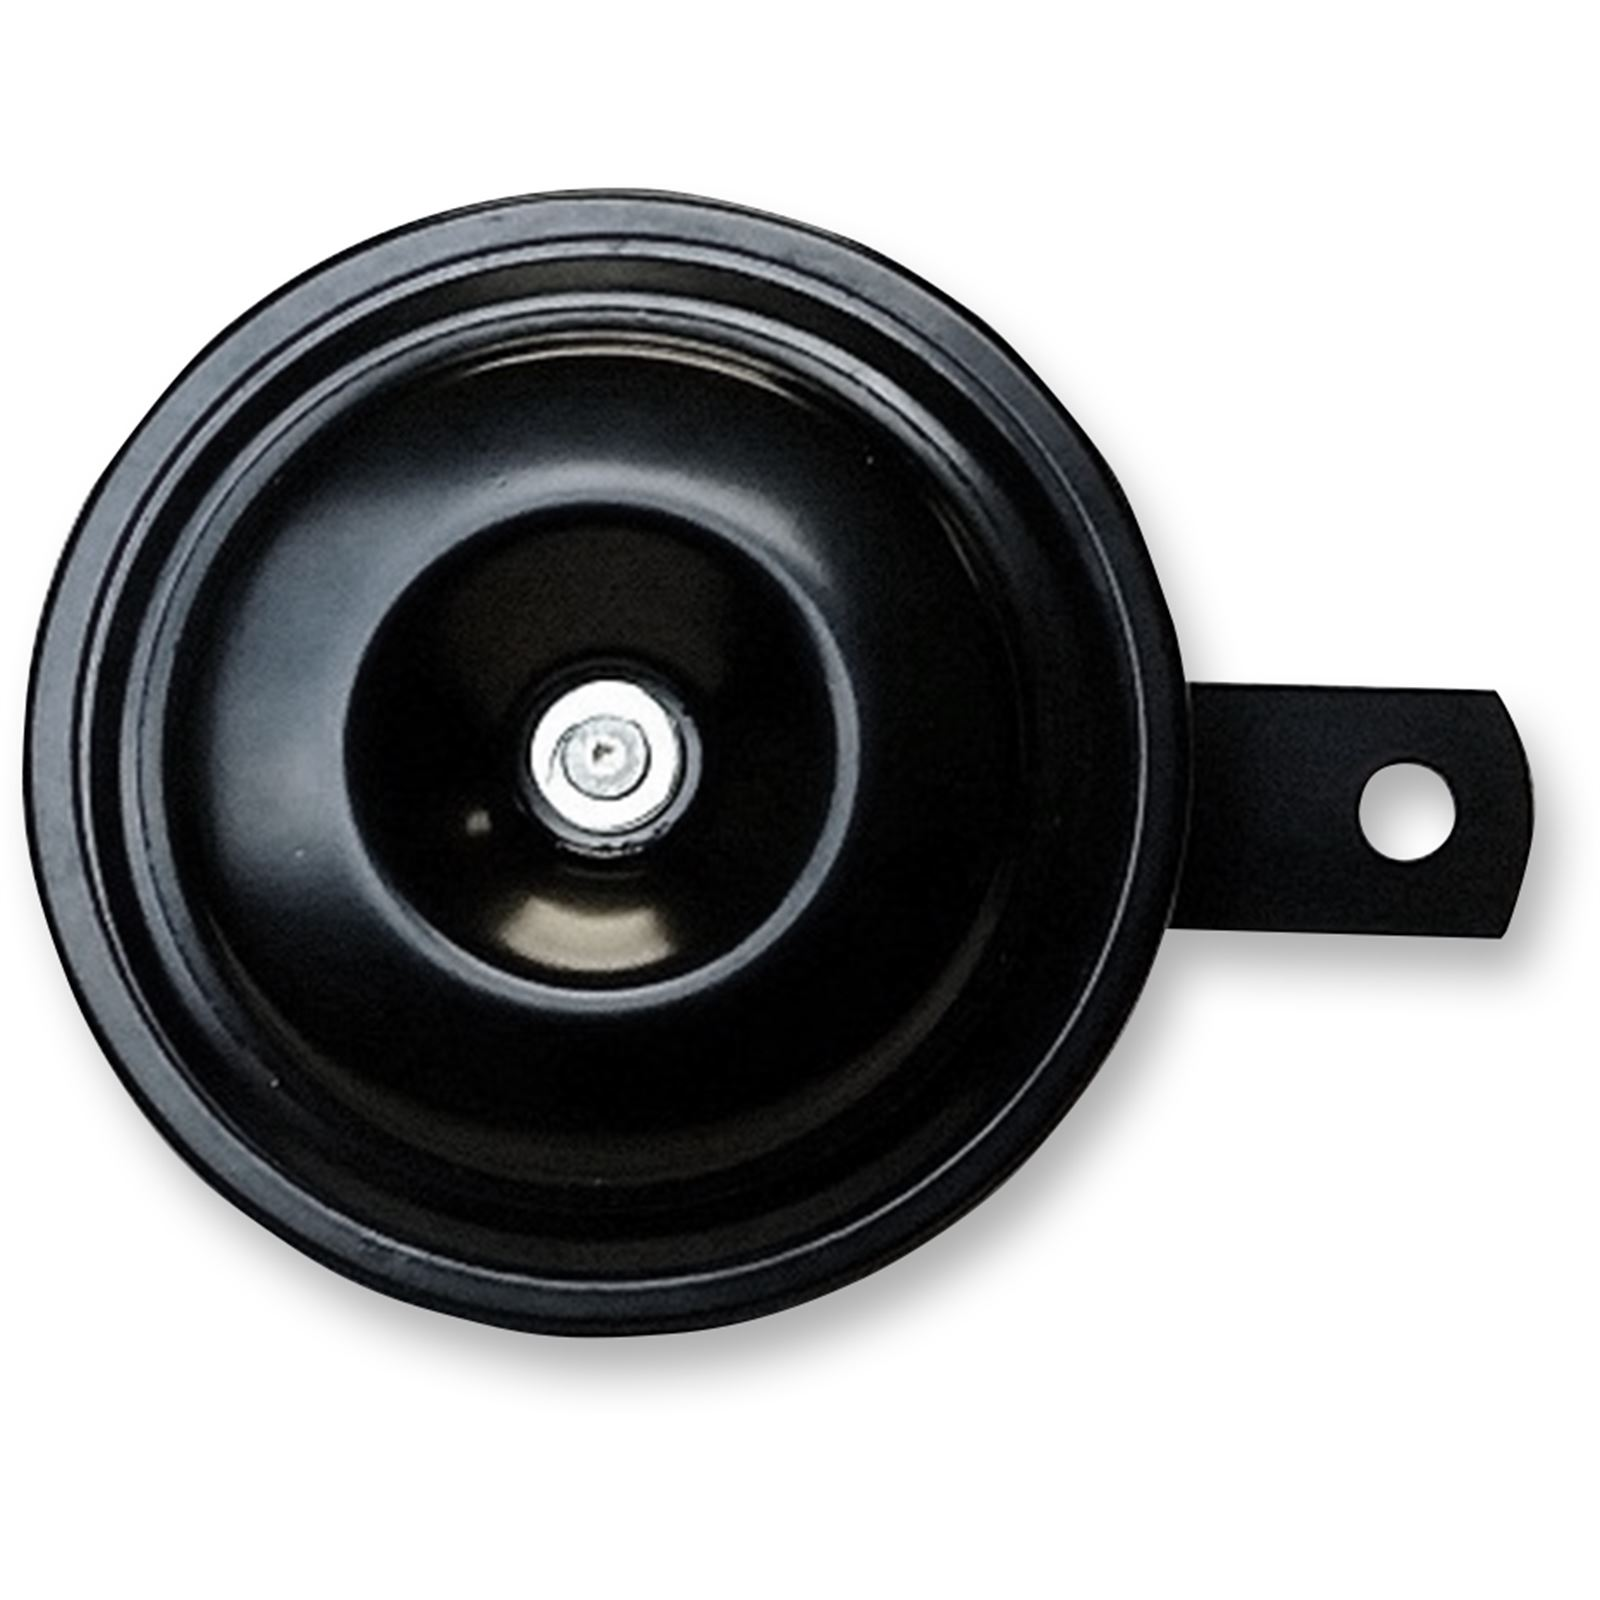 K S Economy Horn - 110 db- Black